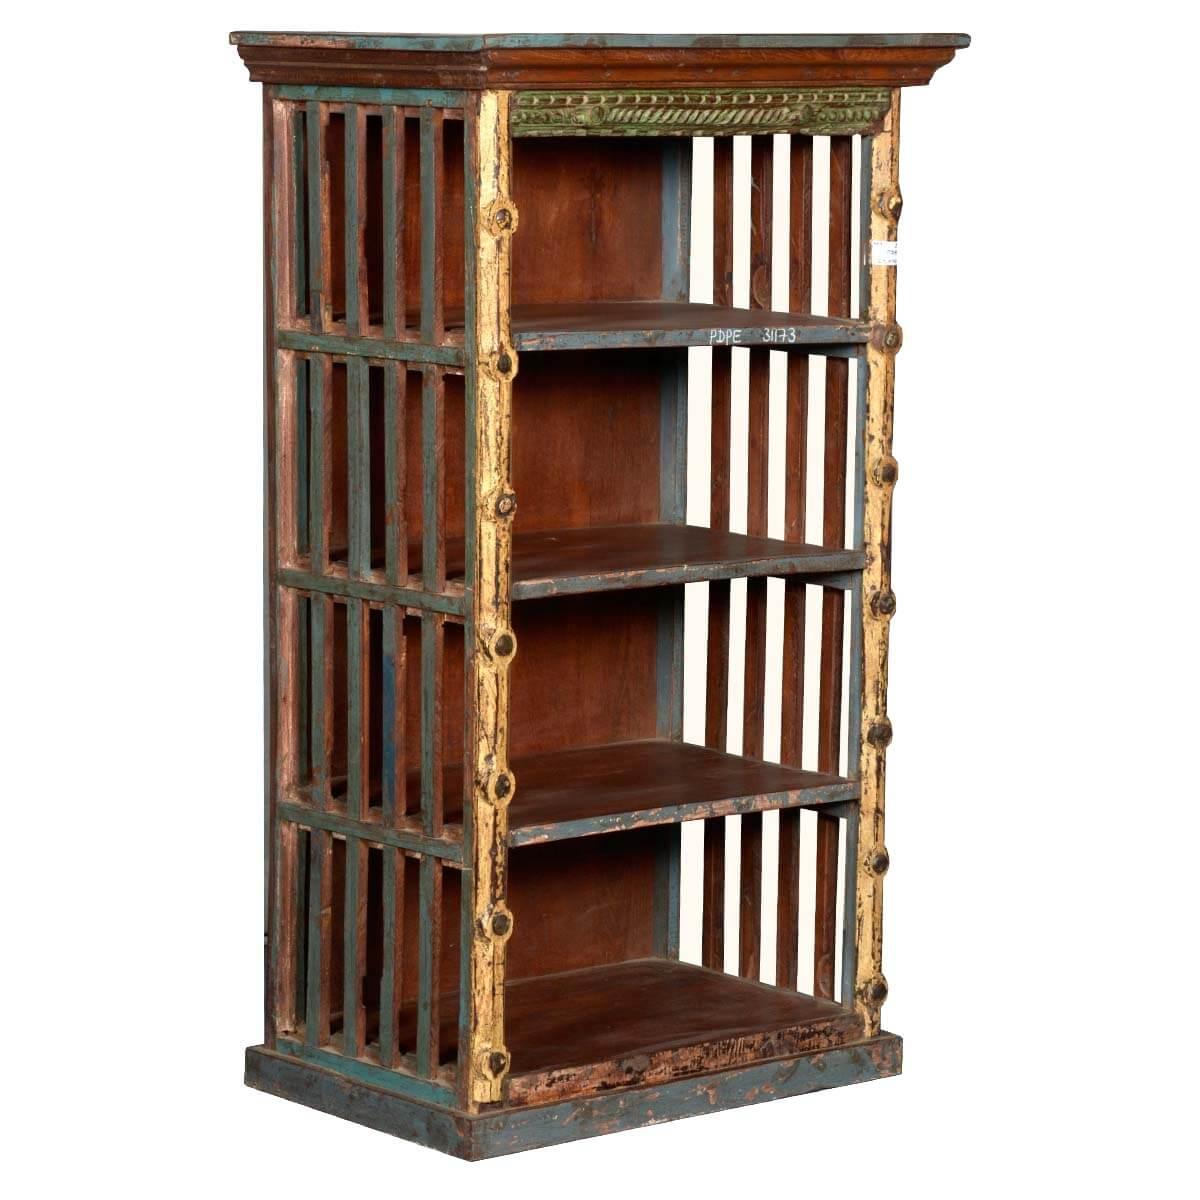 Lakeridge Rustic Reclaimed Wood Open Slats Bookcase Curio Unit